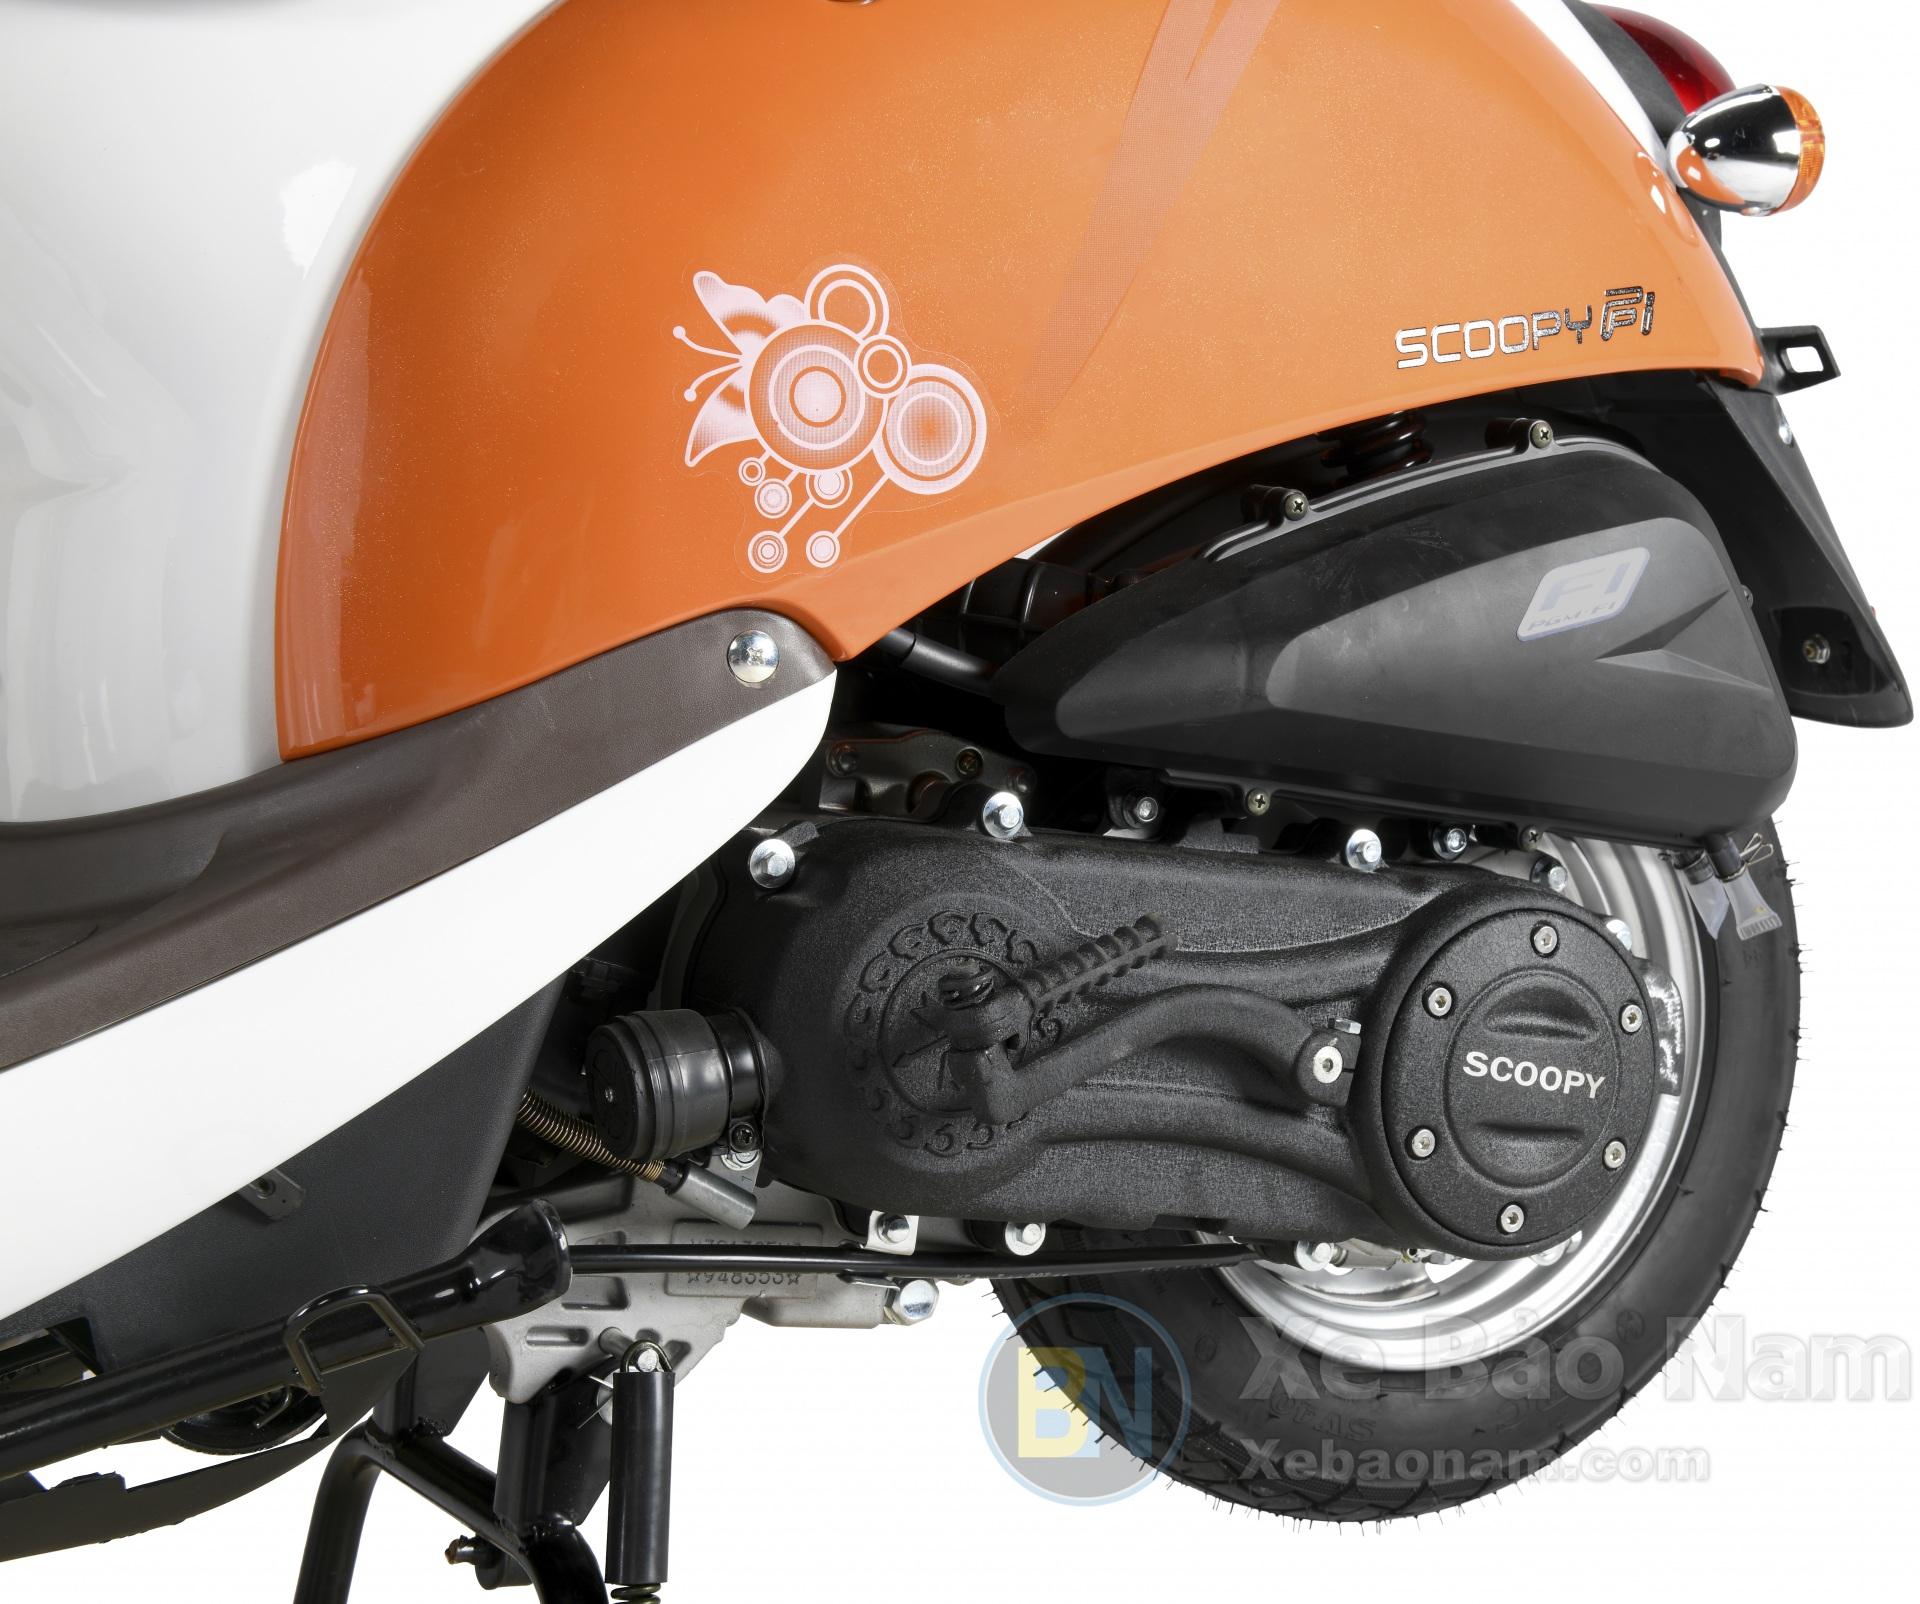 xe-ga-50cc-scoopy-japan-mau-cam-xebaonam-3